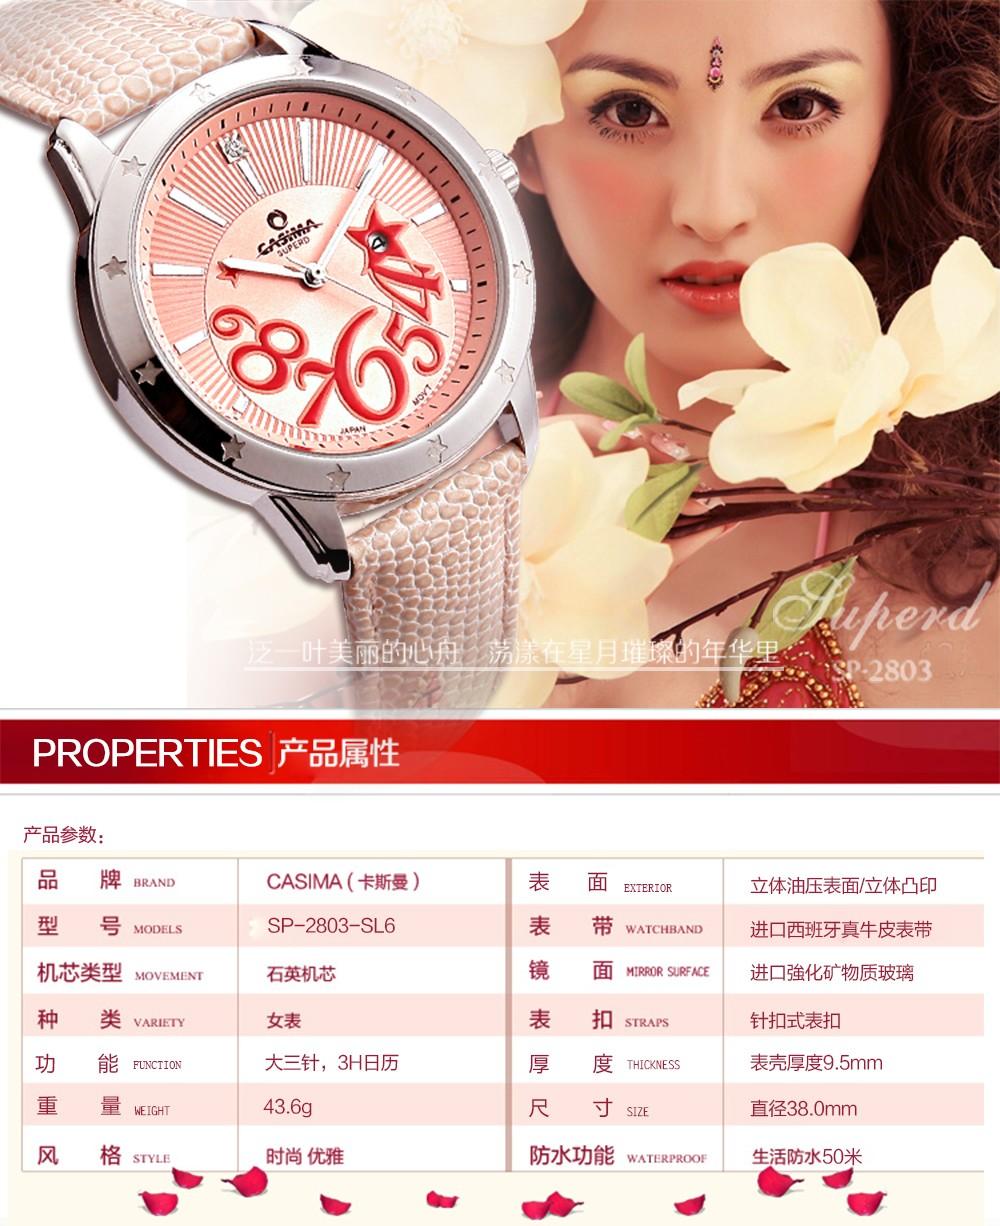 Casima женские часы мода досуг стиль календарь 50 м из водонепроницаемый кварцевые часы # 2803